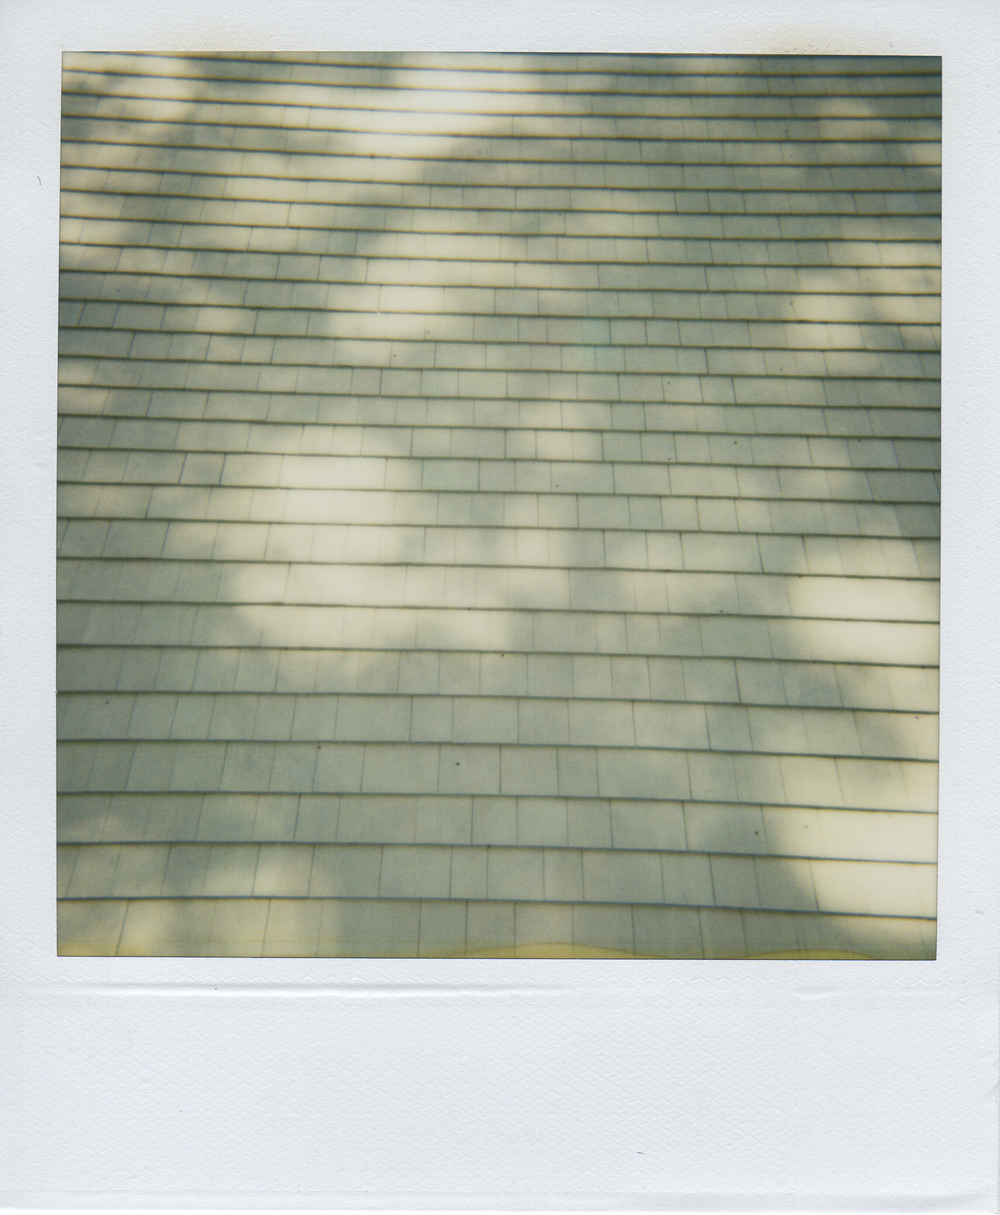 jlaurence-polaroid-045.jpg